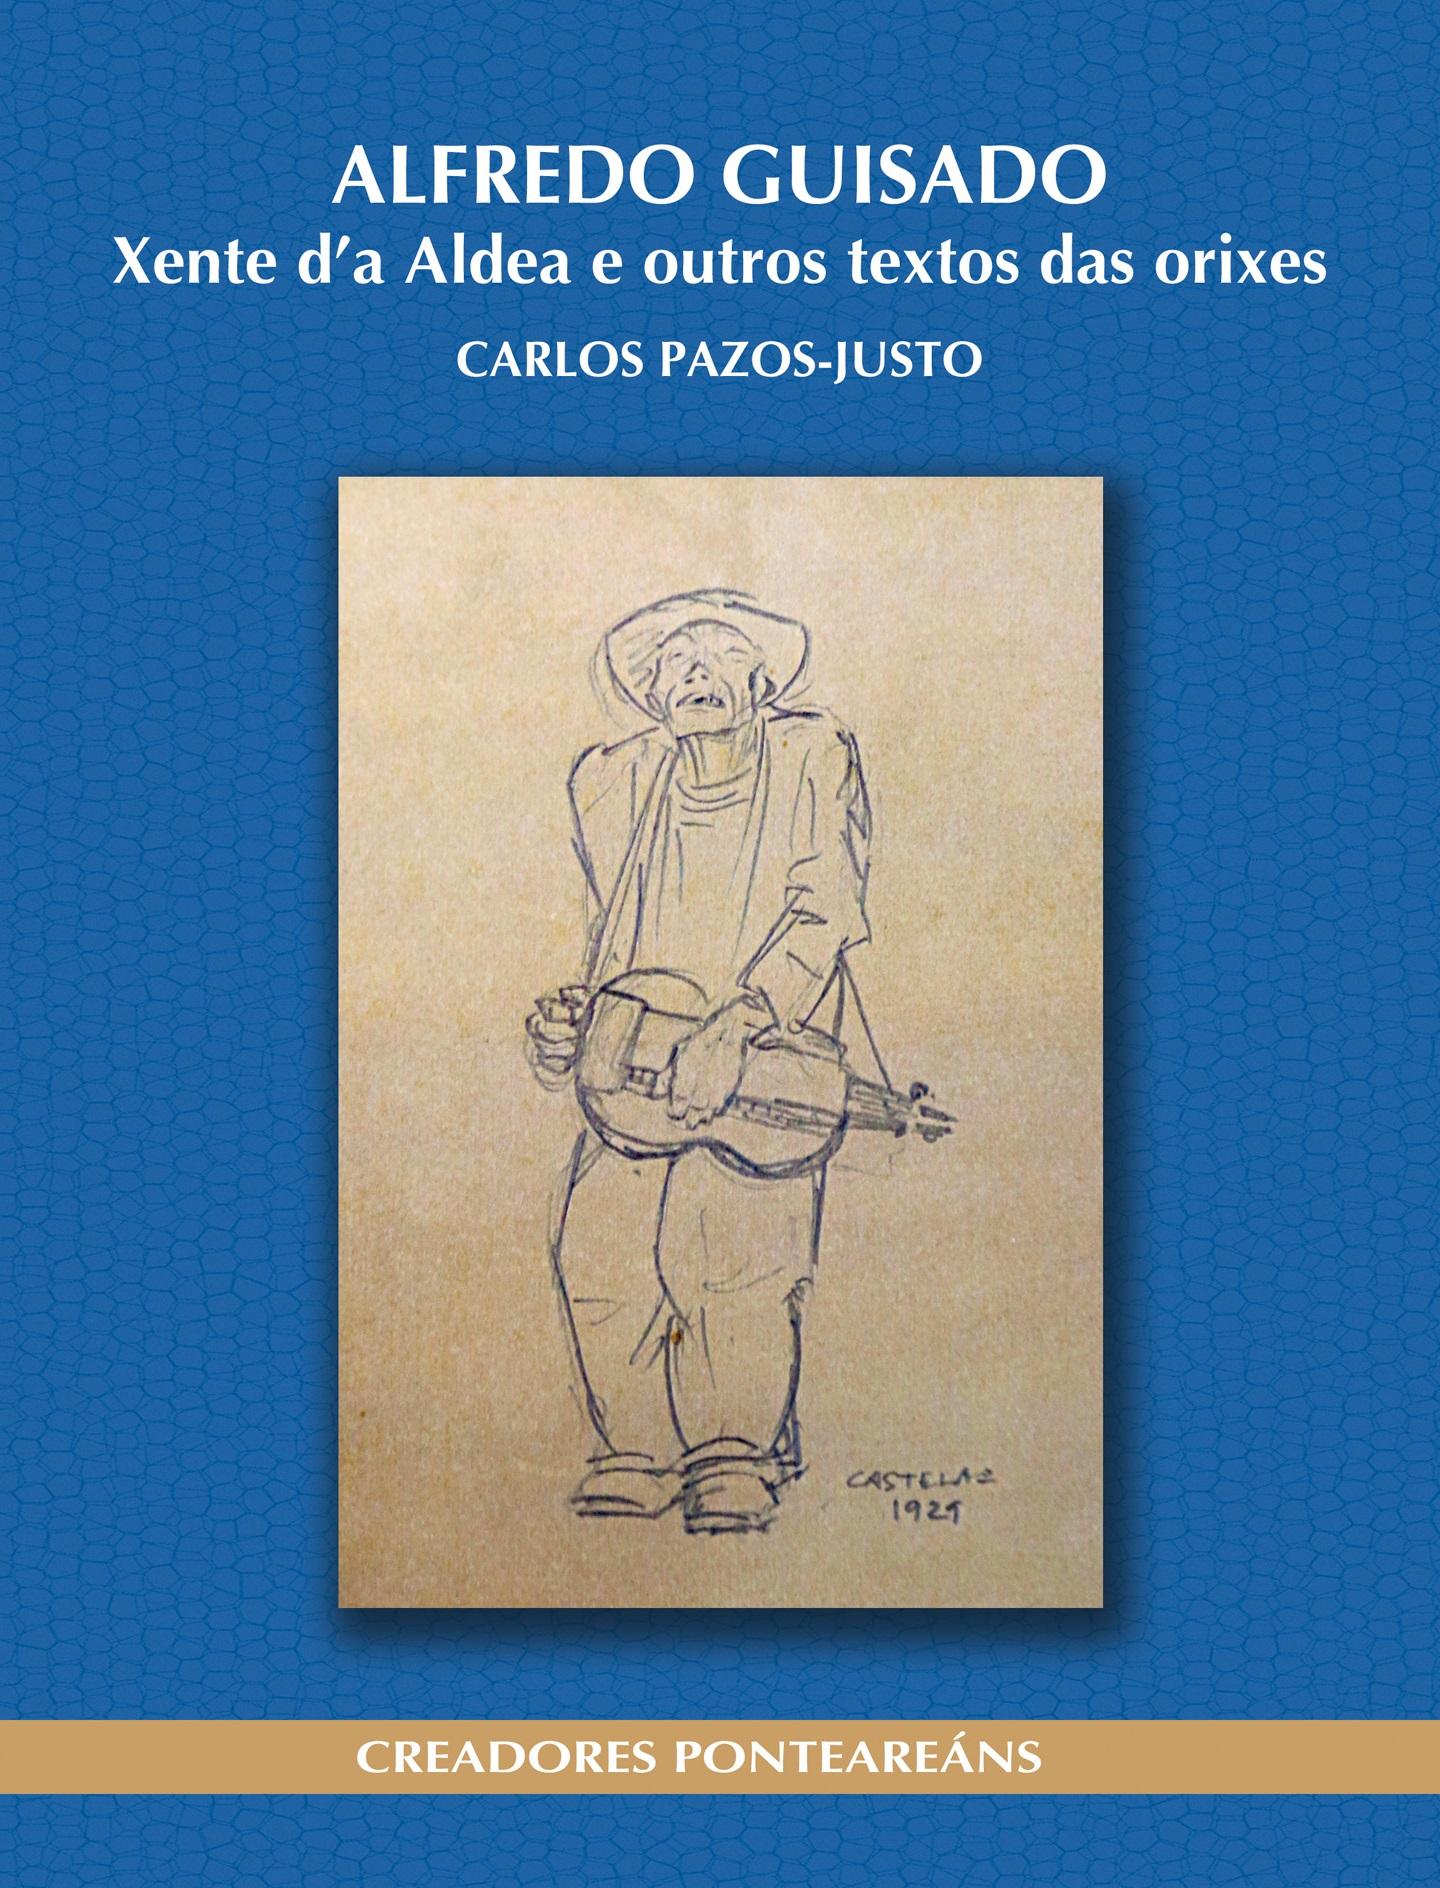 Capa do livro de Carlos Pazos-Justo